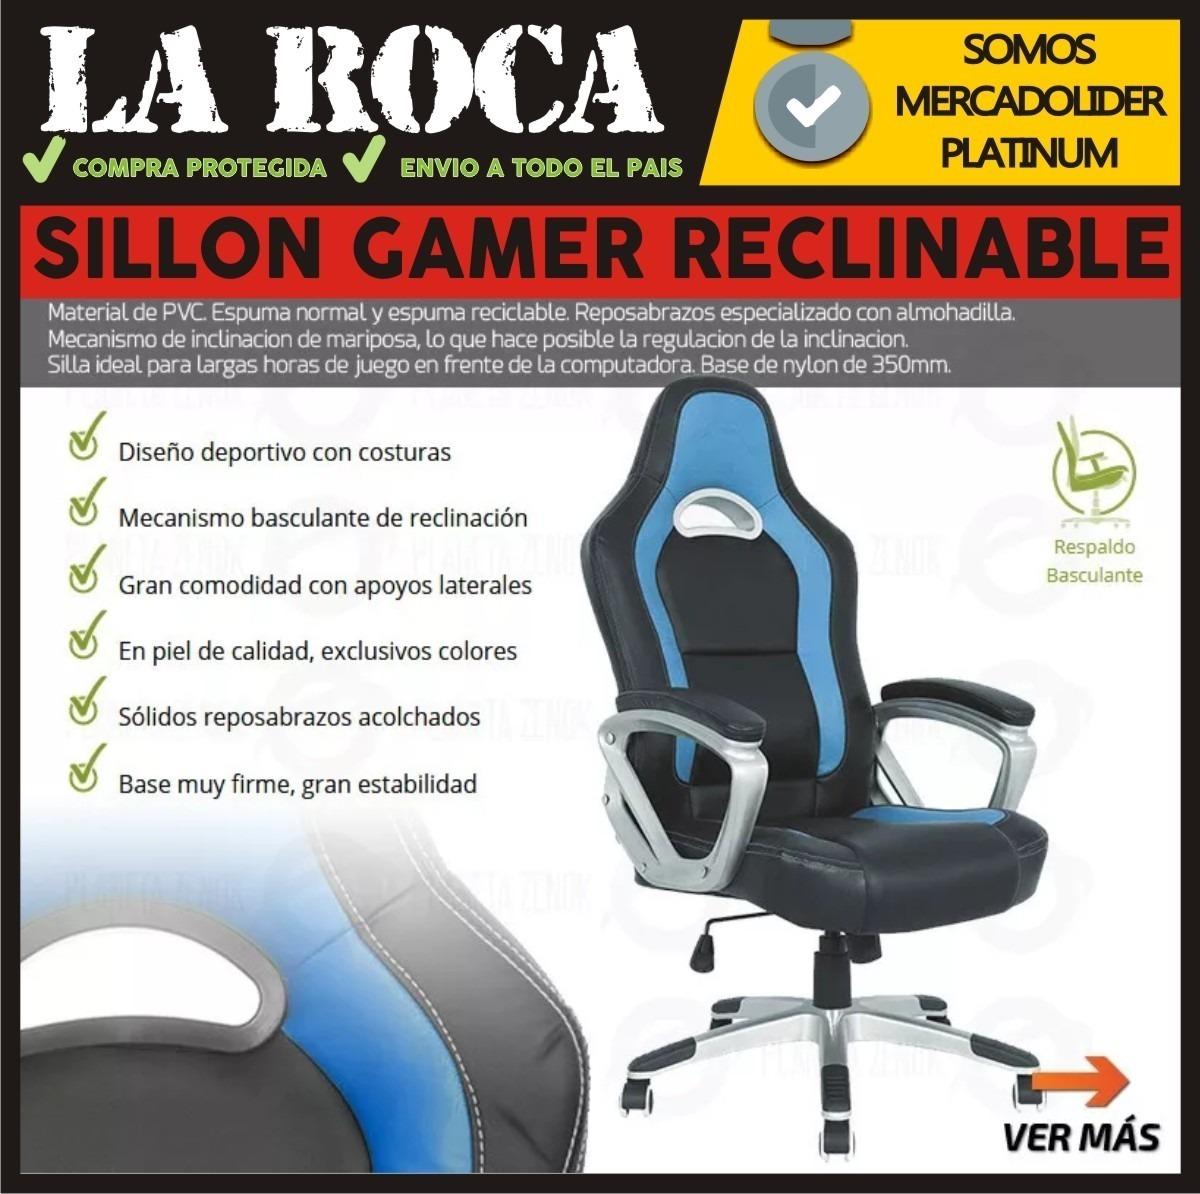 0onpkwx8 Hogar Oficina10 Gamer Silla Butaca Reclinable Pro Sillon 616 5Lq4jRA3